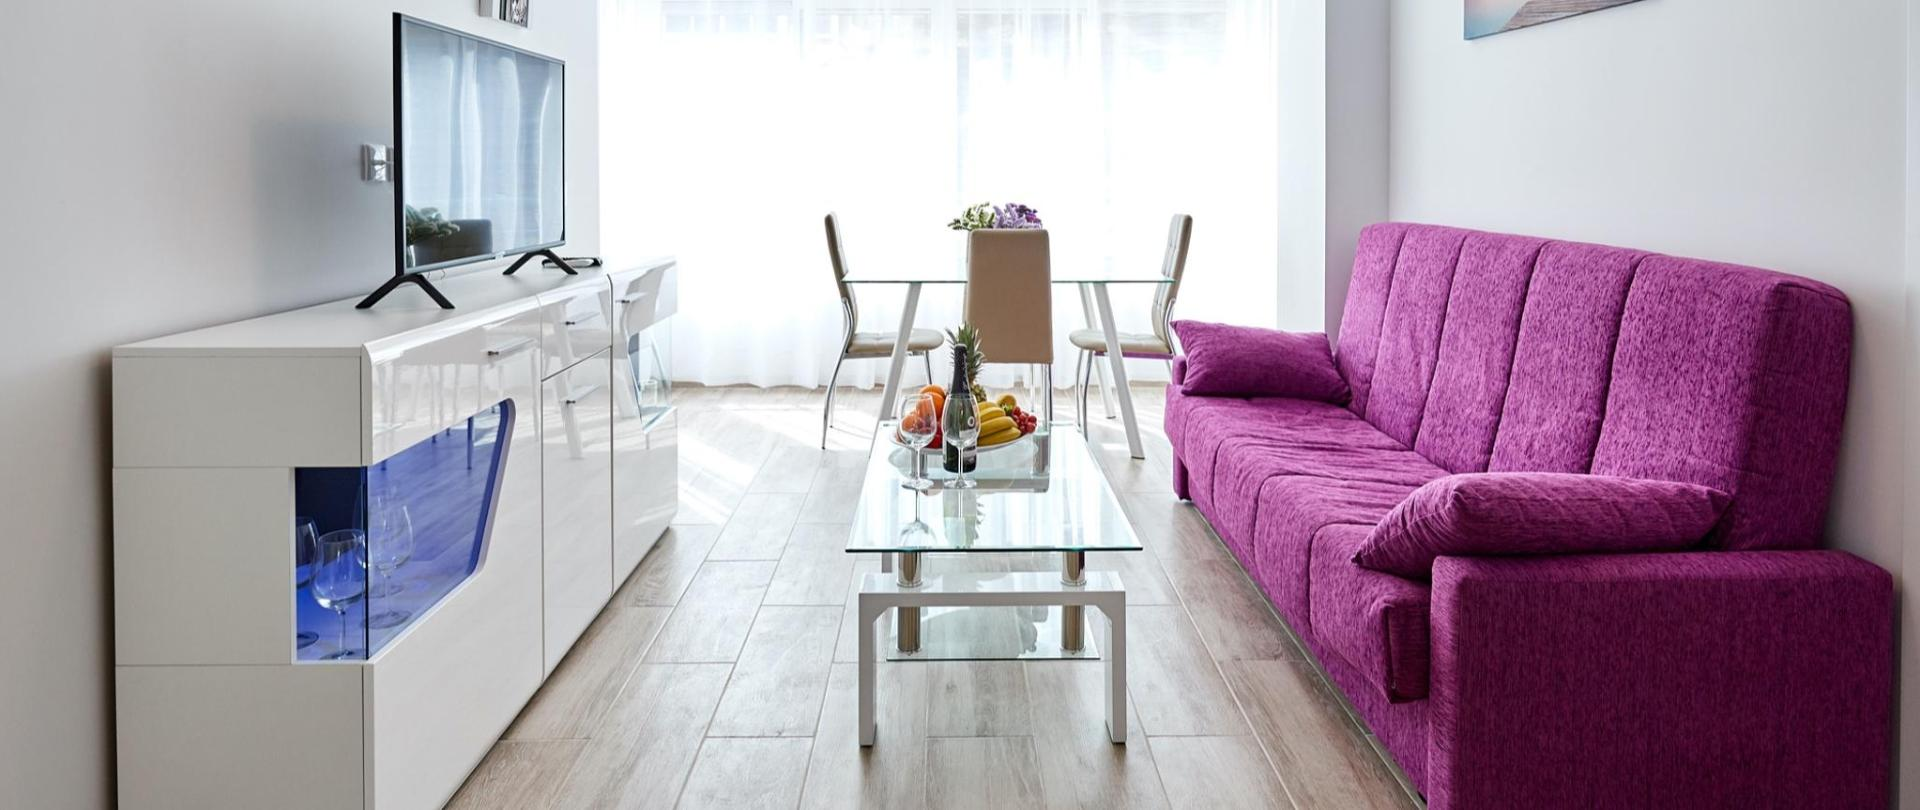 Sonrisa Apartments - Superior Apartments8.jpg